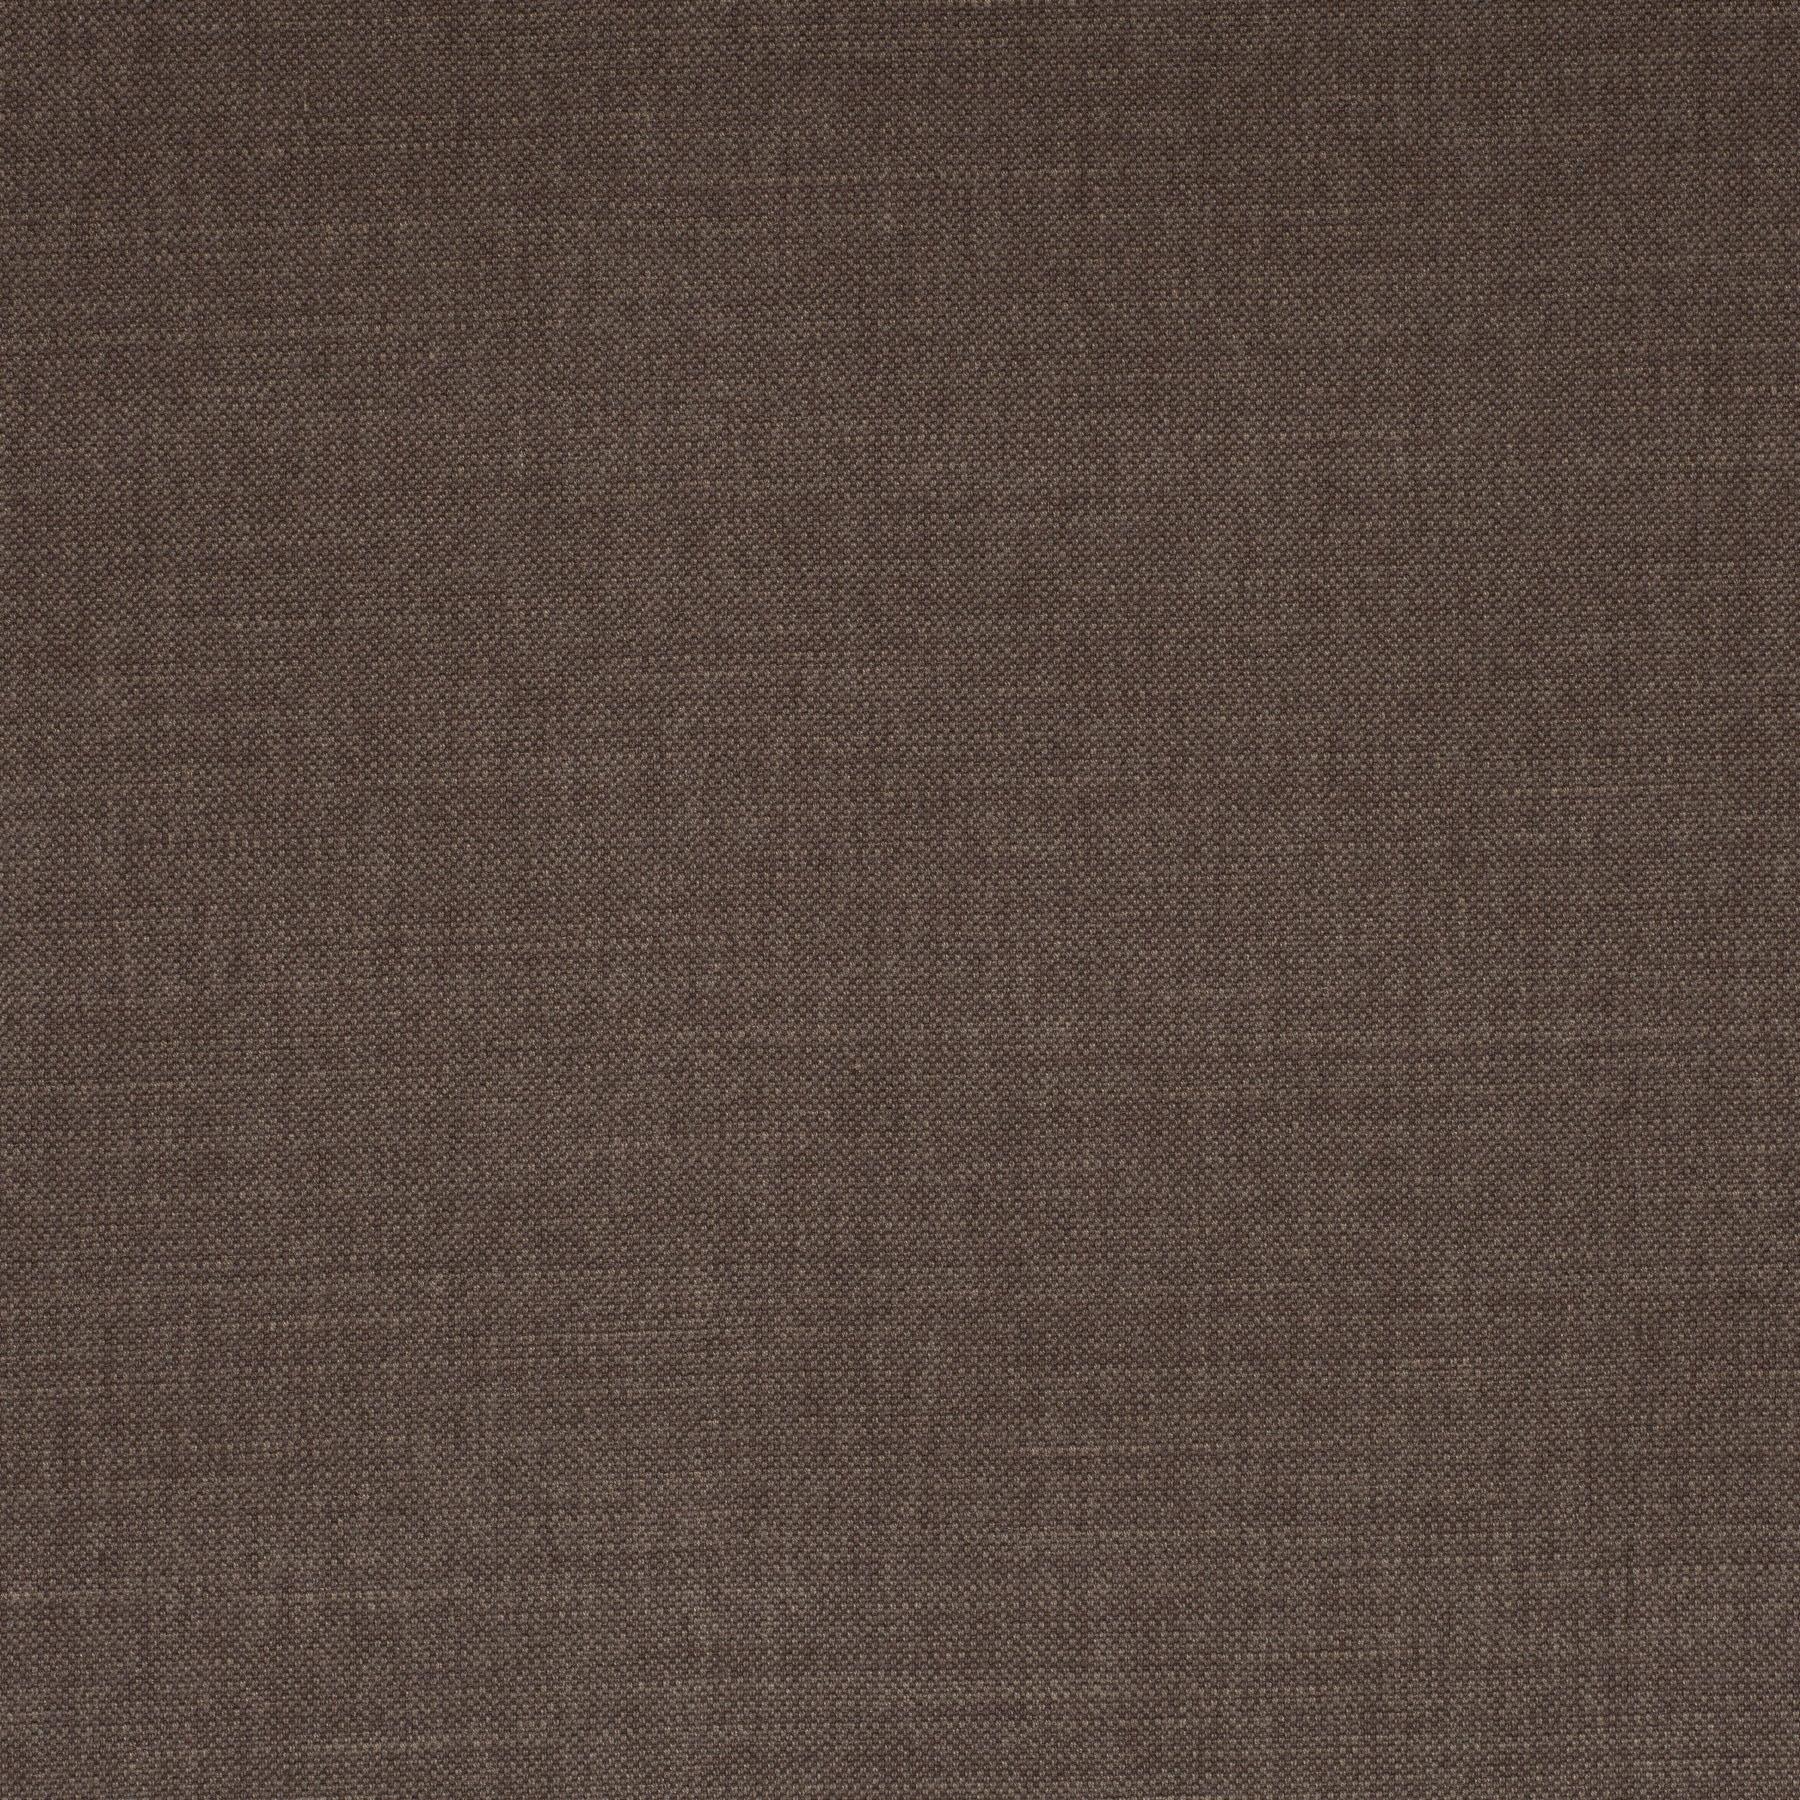 mørk grå-brun hot madison CH1249/020-0